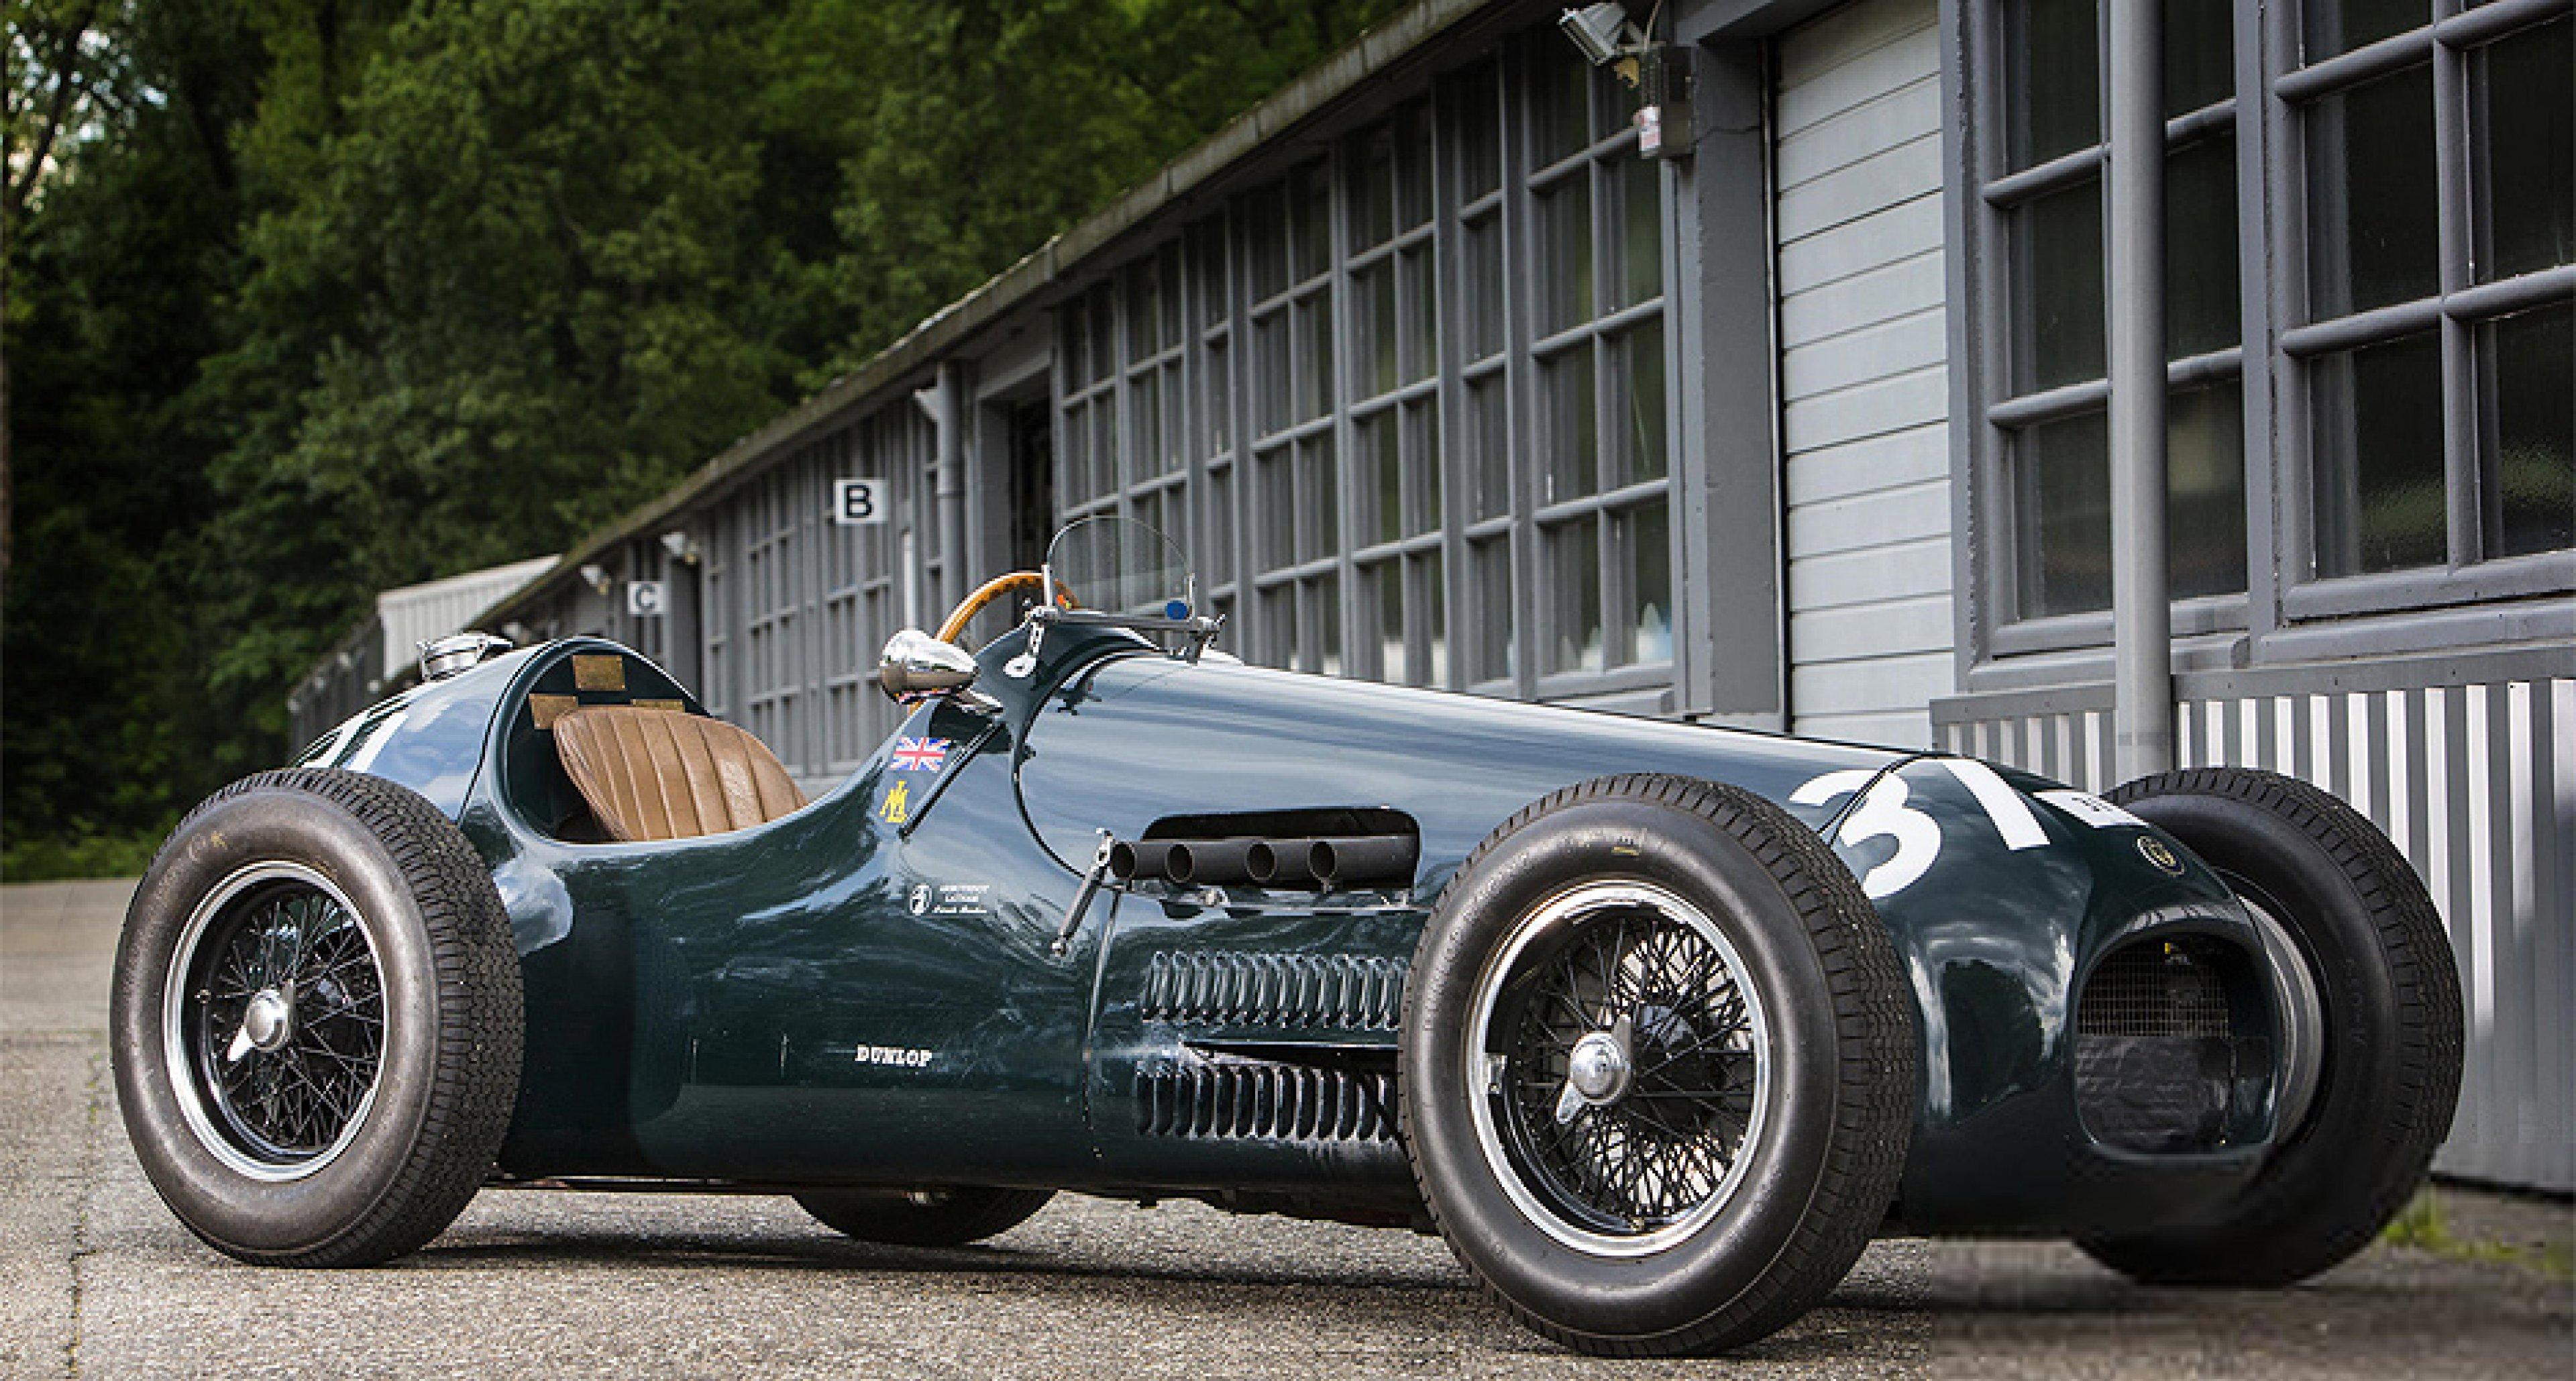 1952 HWM Formula 2 / 'Tasman' Single-Seater (GBP 160,000 - 190,000)